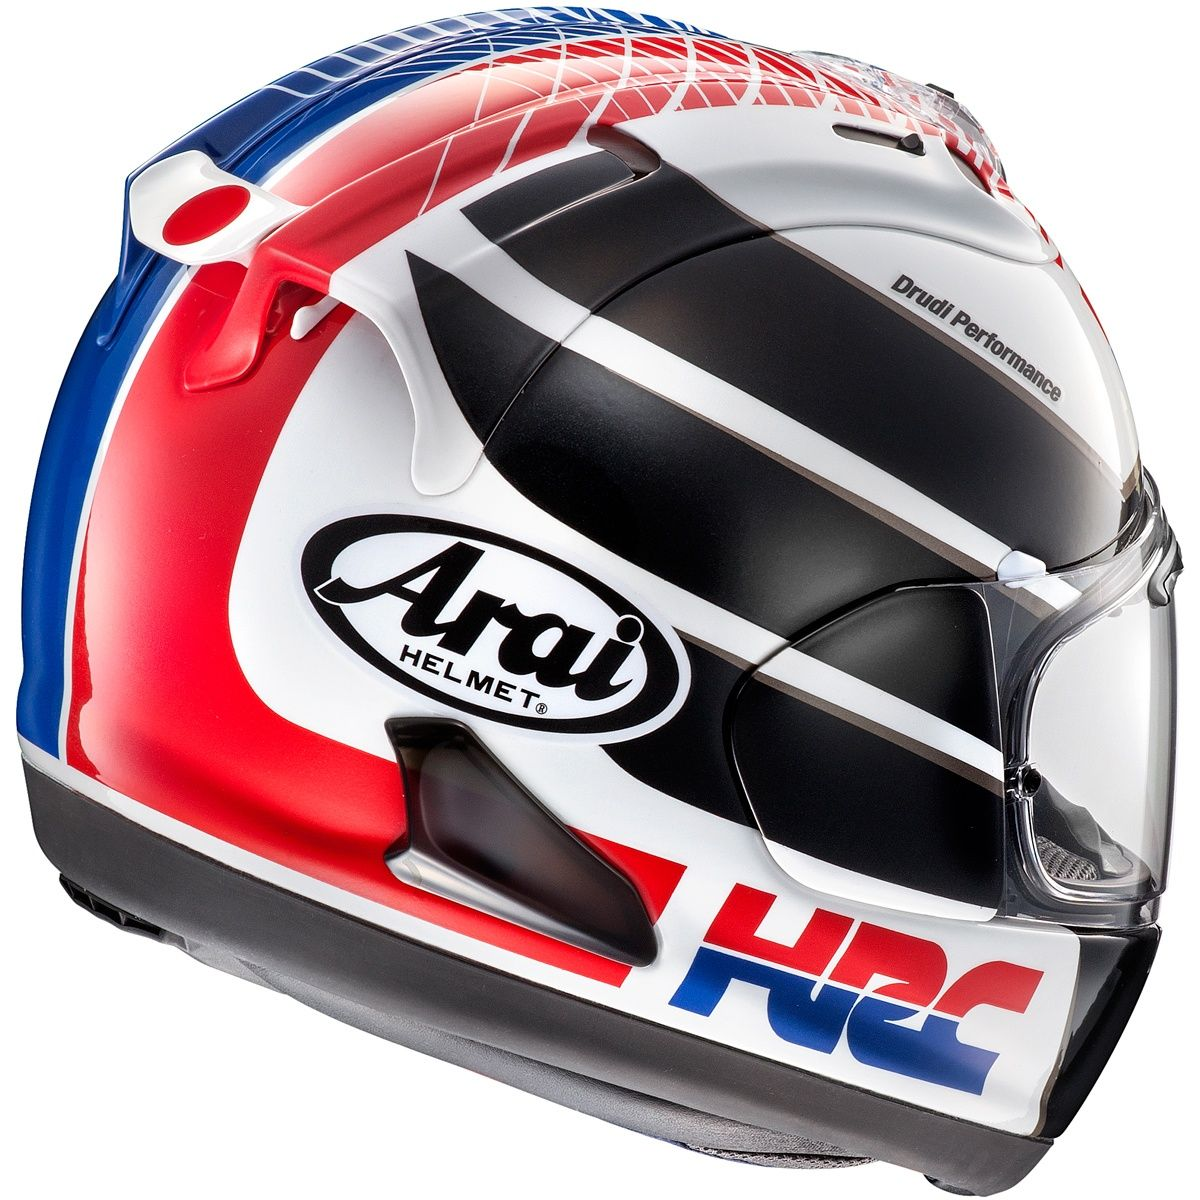 13df3943 Arai Corsair-X Nicky-7 Full Face Helmet | Motorcycle Helmets | Helmet, Full  face helmets, Arai helmets